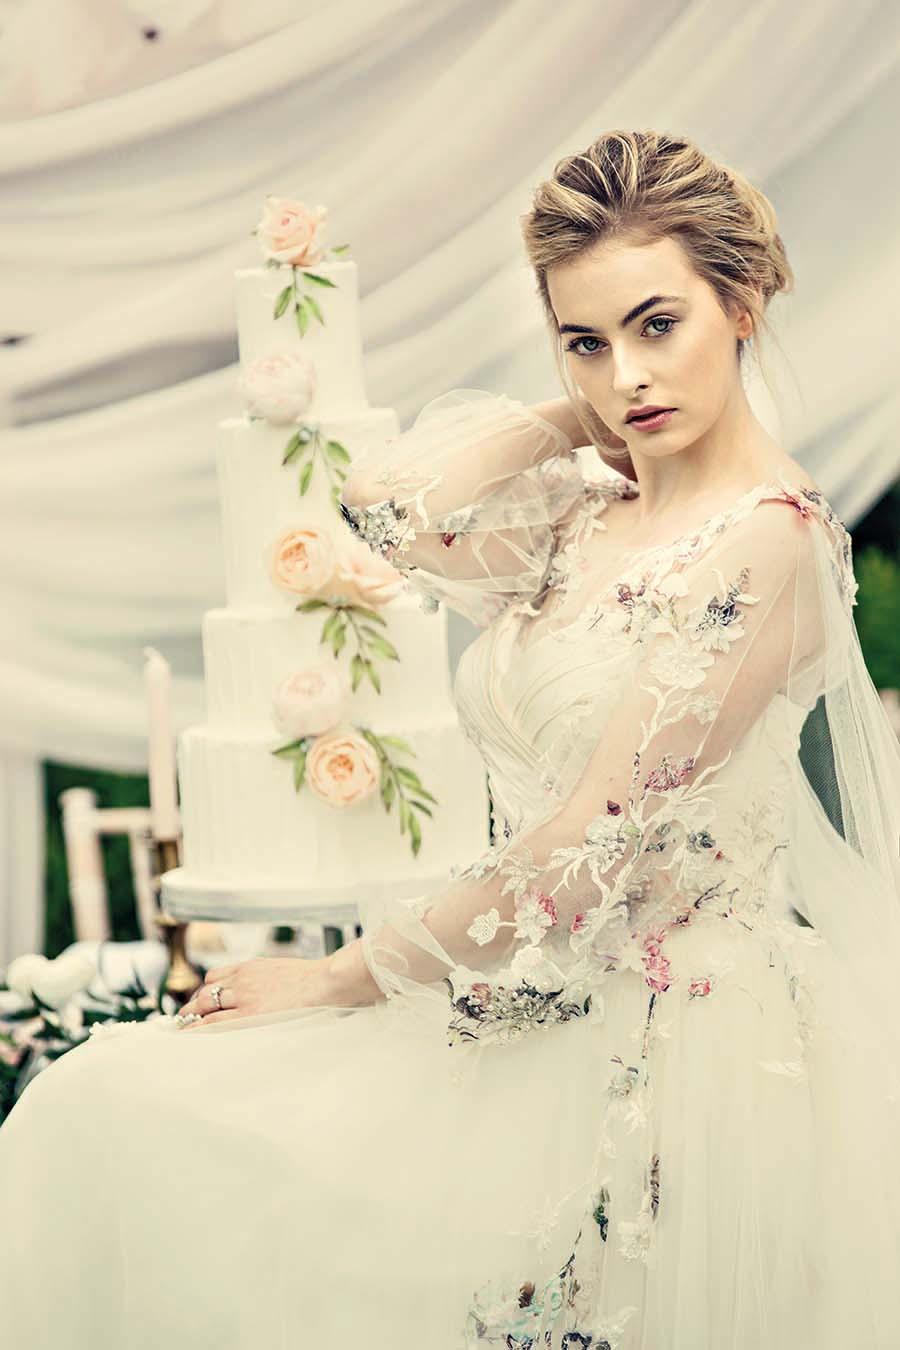 Buckinghams Wedding Magazine – Hodsock Photoshoot 2018 – Dottie Photography (85)